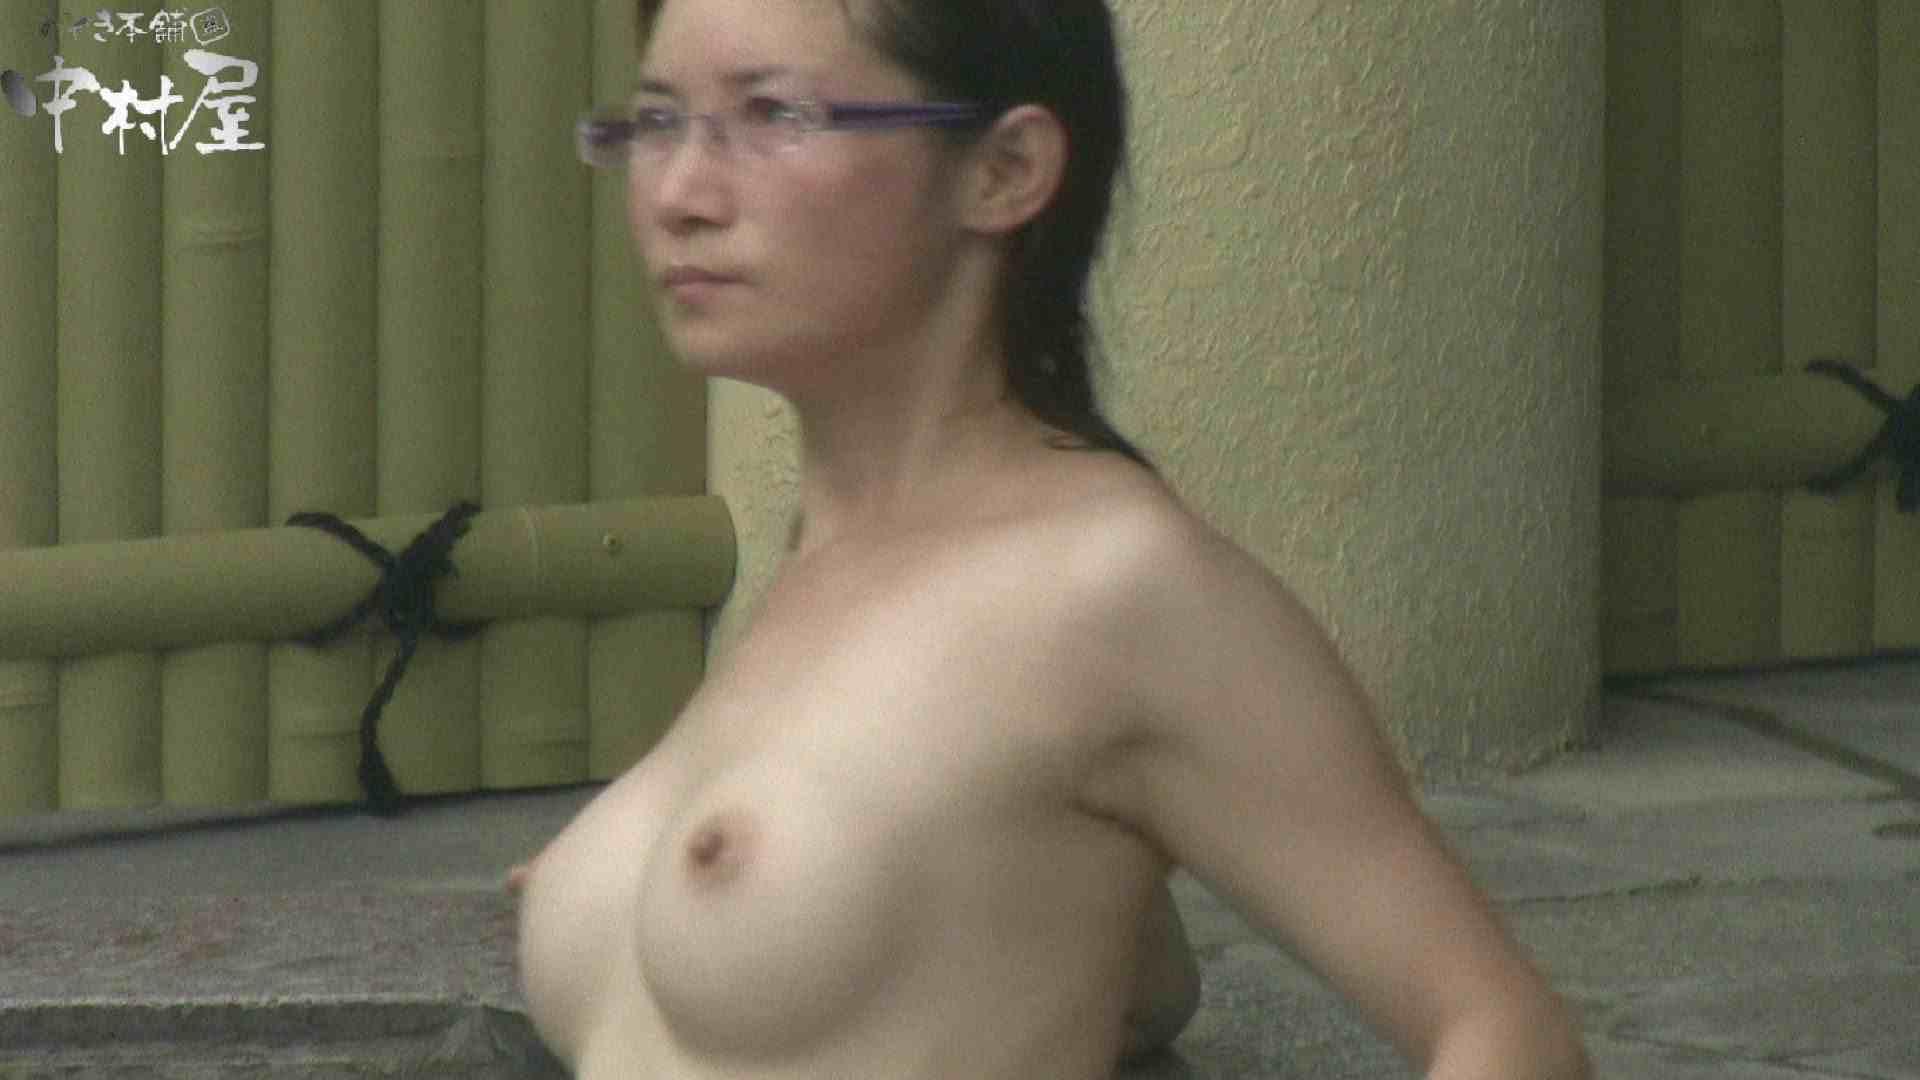 Aquaな露天風呂Vol.905 OLセックス  71画像 15